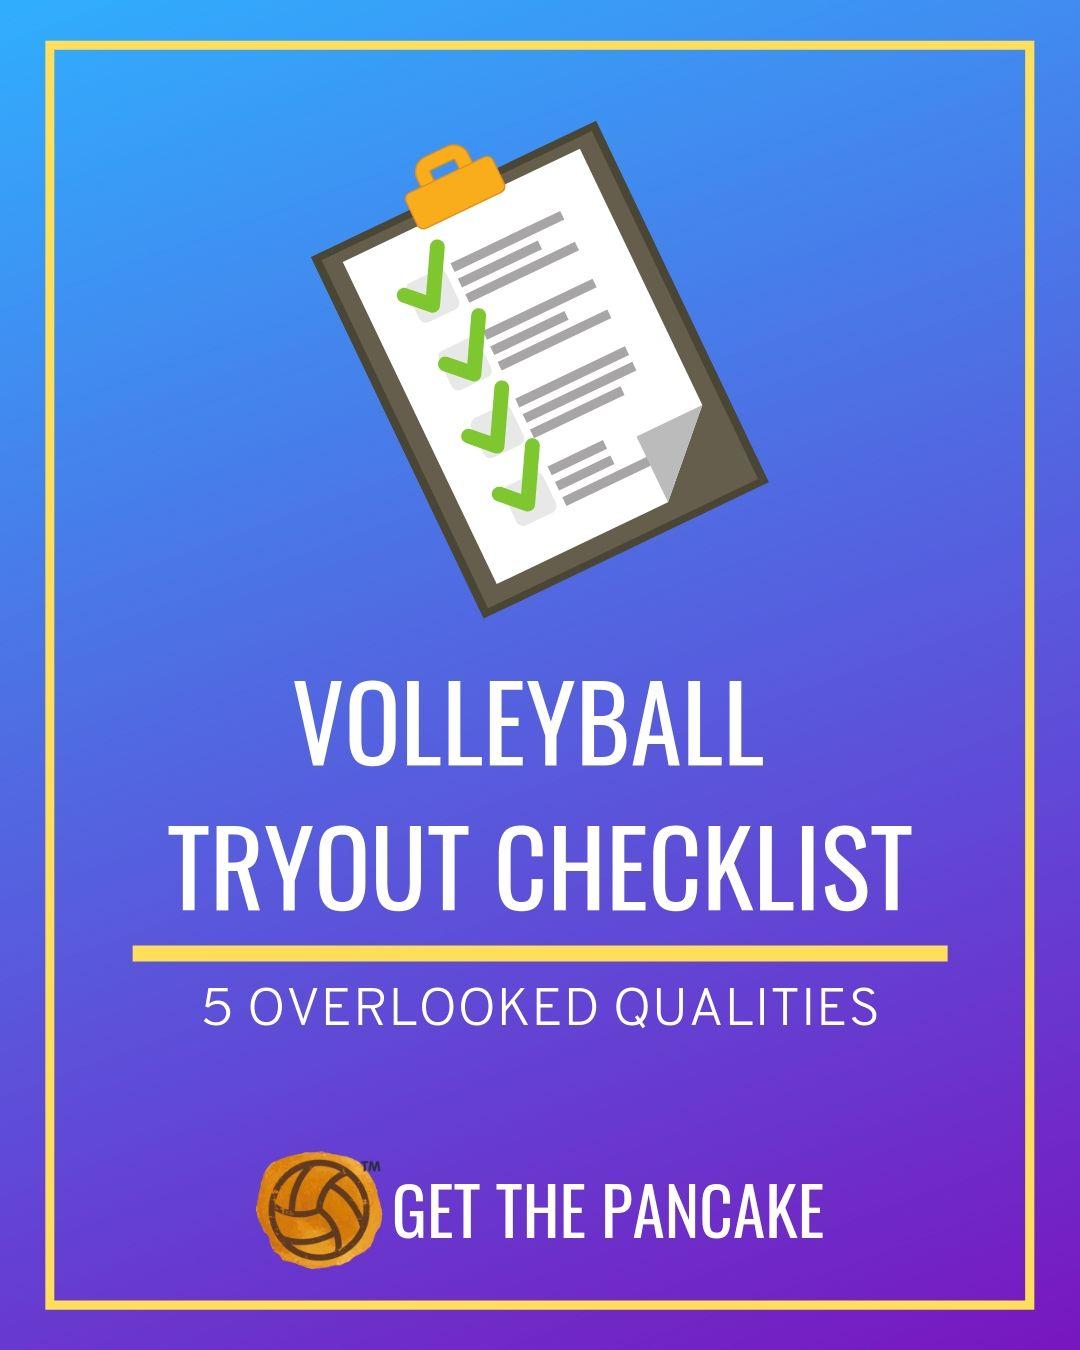 Volleyball Tryout Checklist.jpg